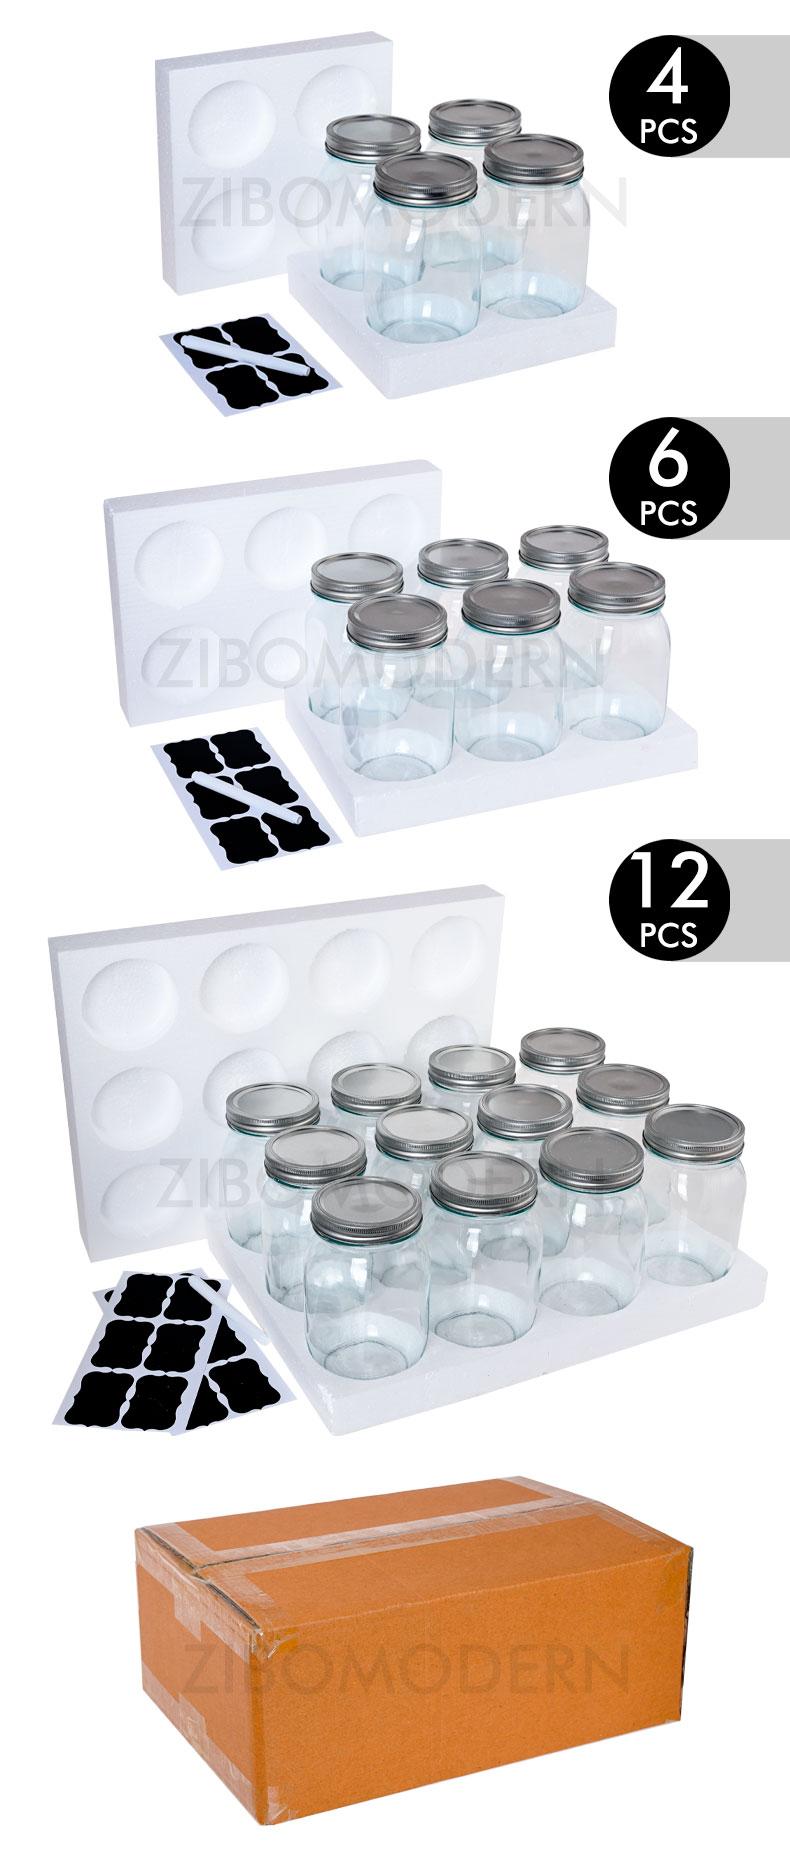 32 OZ / 1000 ML Air-tight Glass Mason Jar, Canning Jar, Glass Kitchen Canning With  Airtight Lid - Canning Jar Storage